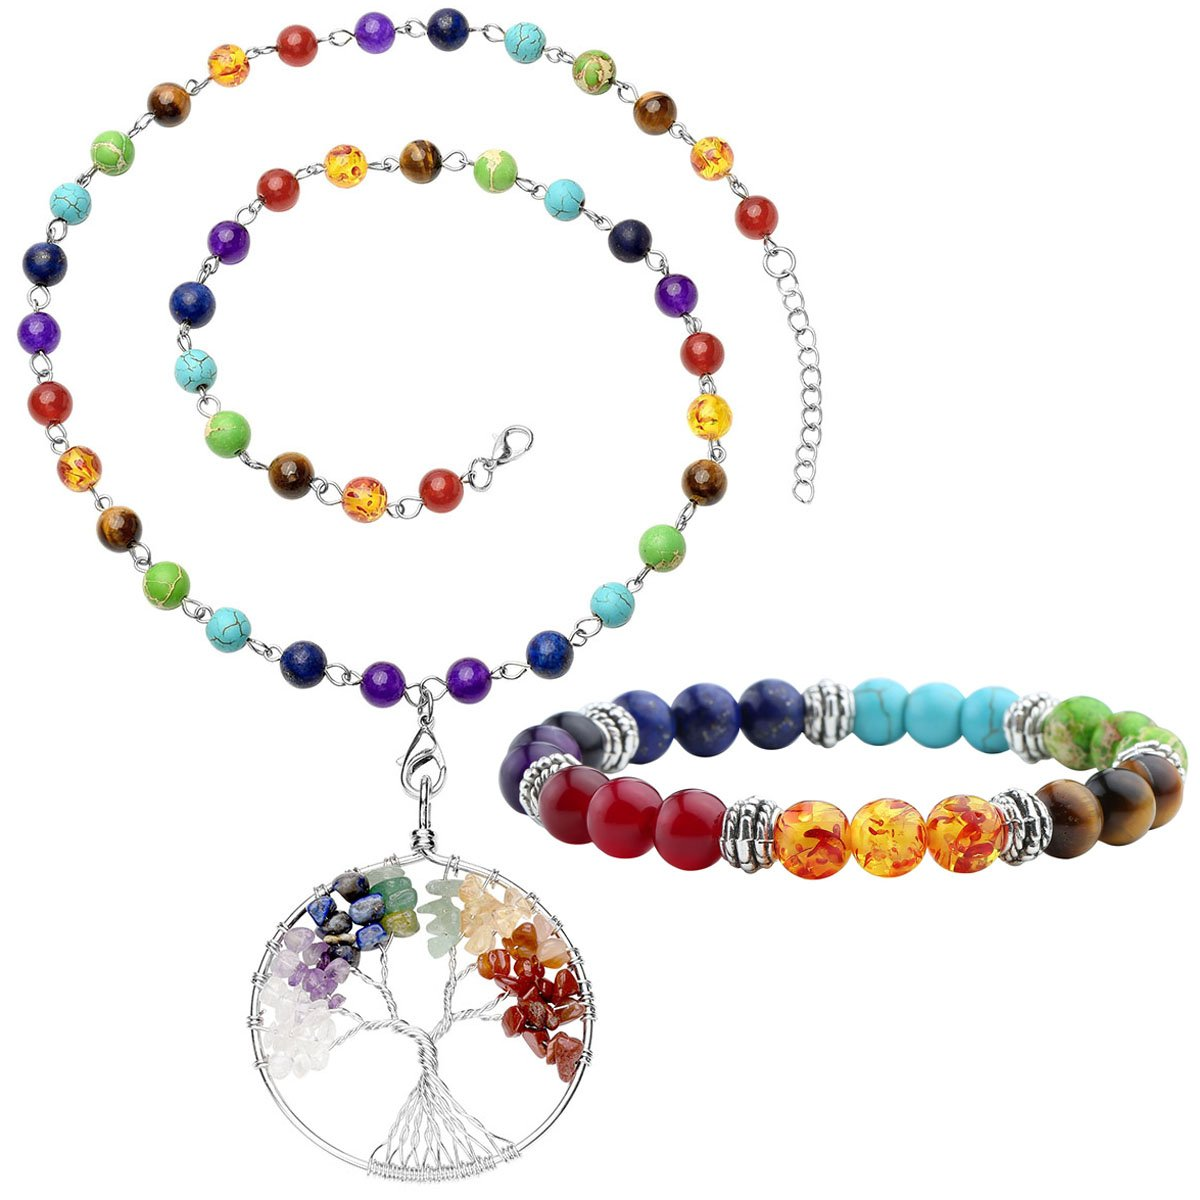 Top Plaza 7 Chakra Gemstones Tree of Life Healing Crystal Energy Yoga Balance Meditation Semi Precious Beads Necklace Bracelet Set(#1 Silver Round)